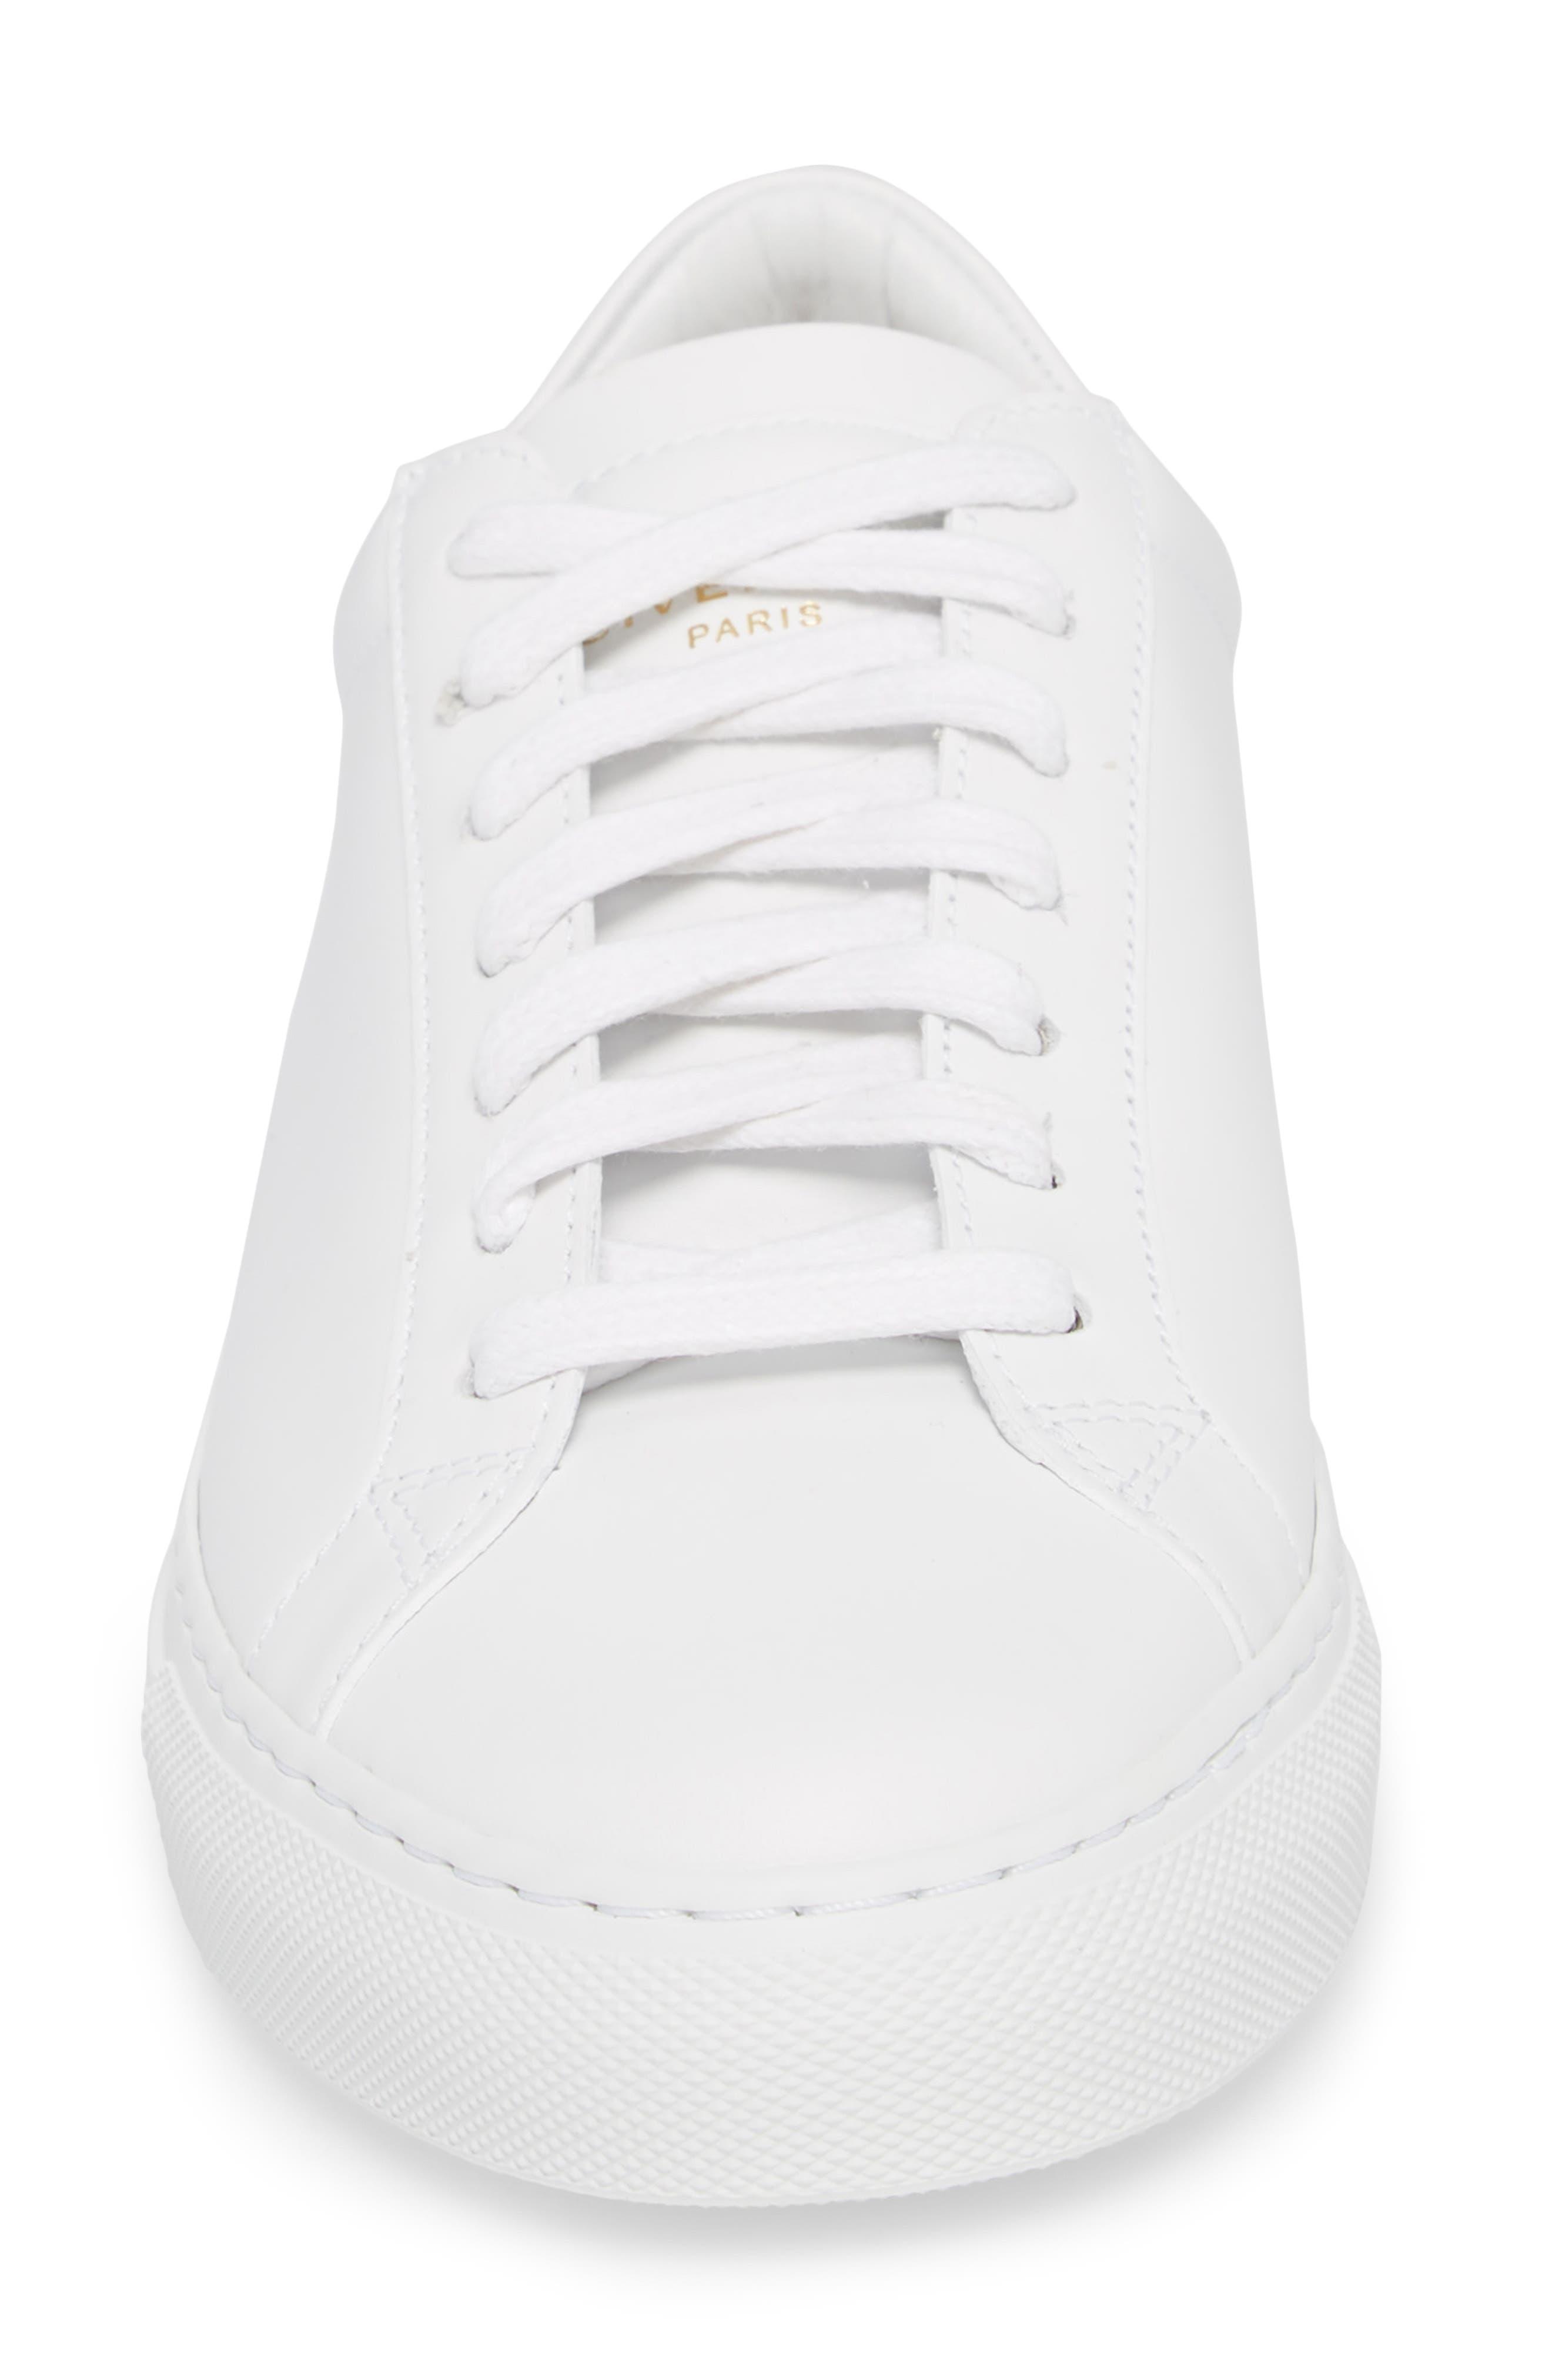 Low Top Sneaker,                             Alternate thumbnail 4, color,                             OPTIC WHITE